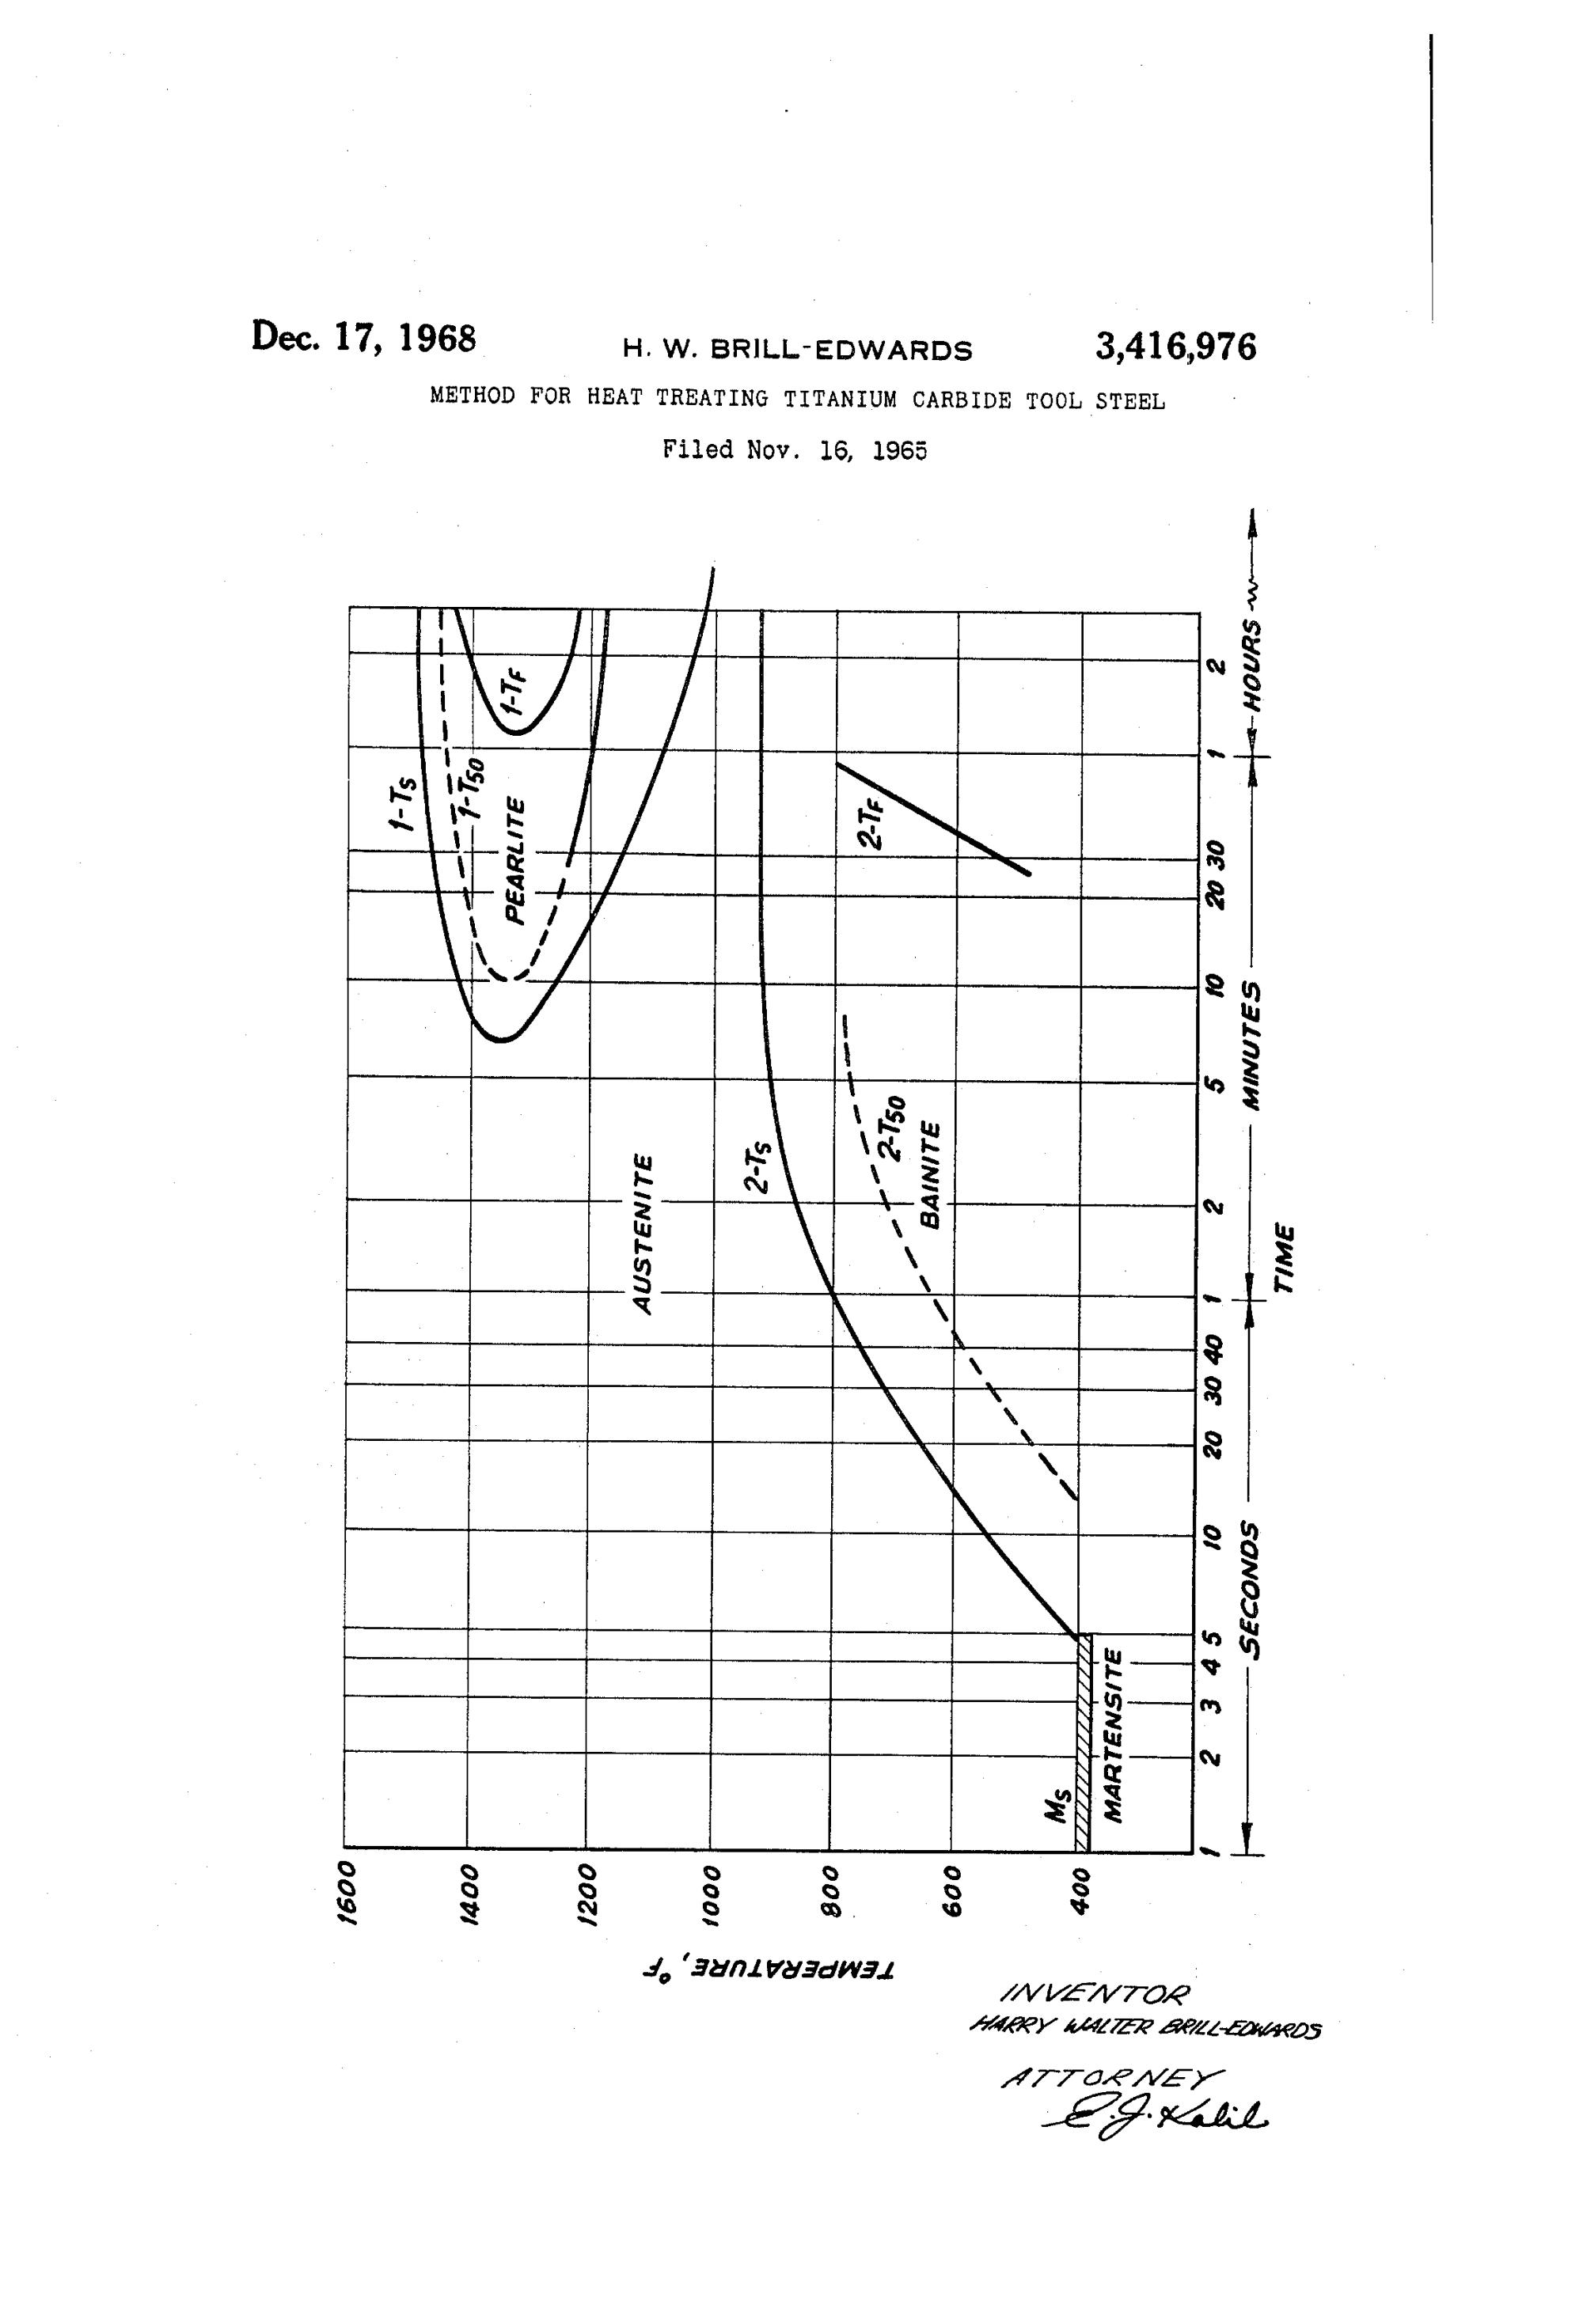 hight resolution of patent us3416976 method for heat treating titanium carbide tool steel google patents